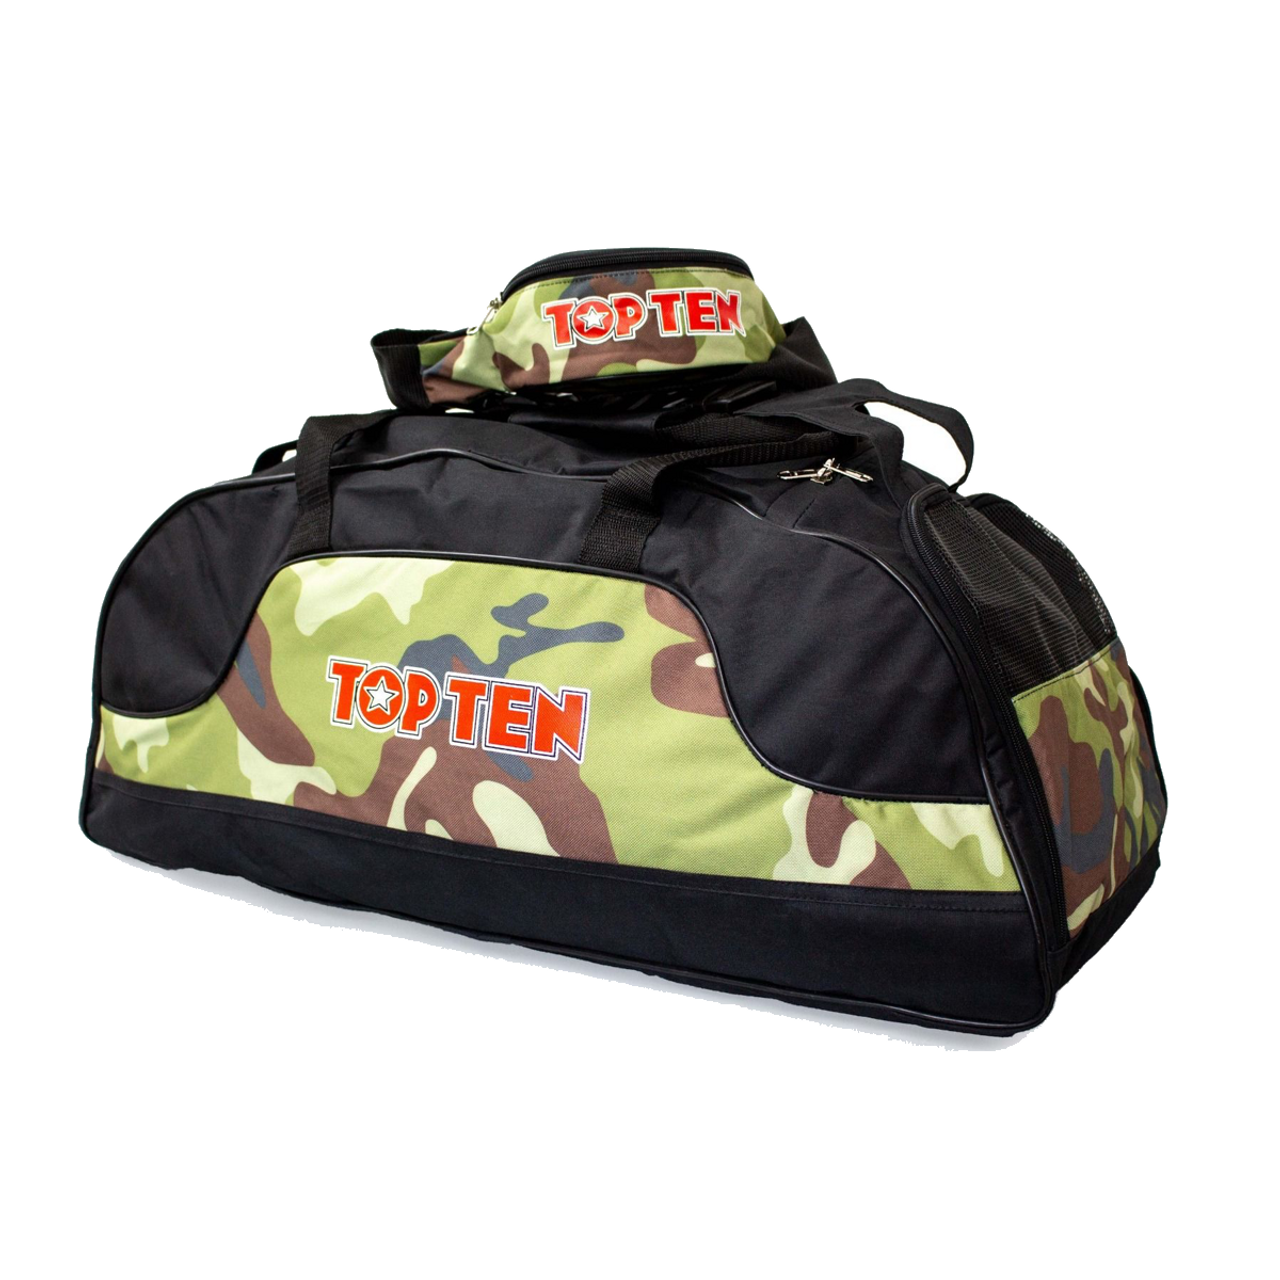 230069606e6f TOP TEN Sports Bag CAMO BLACK Large - Kicksport